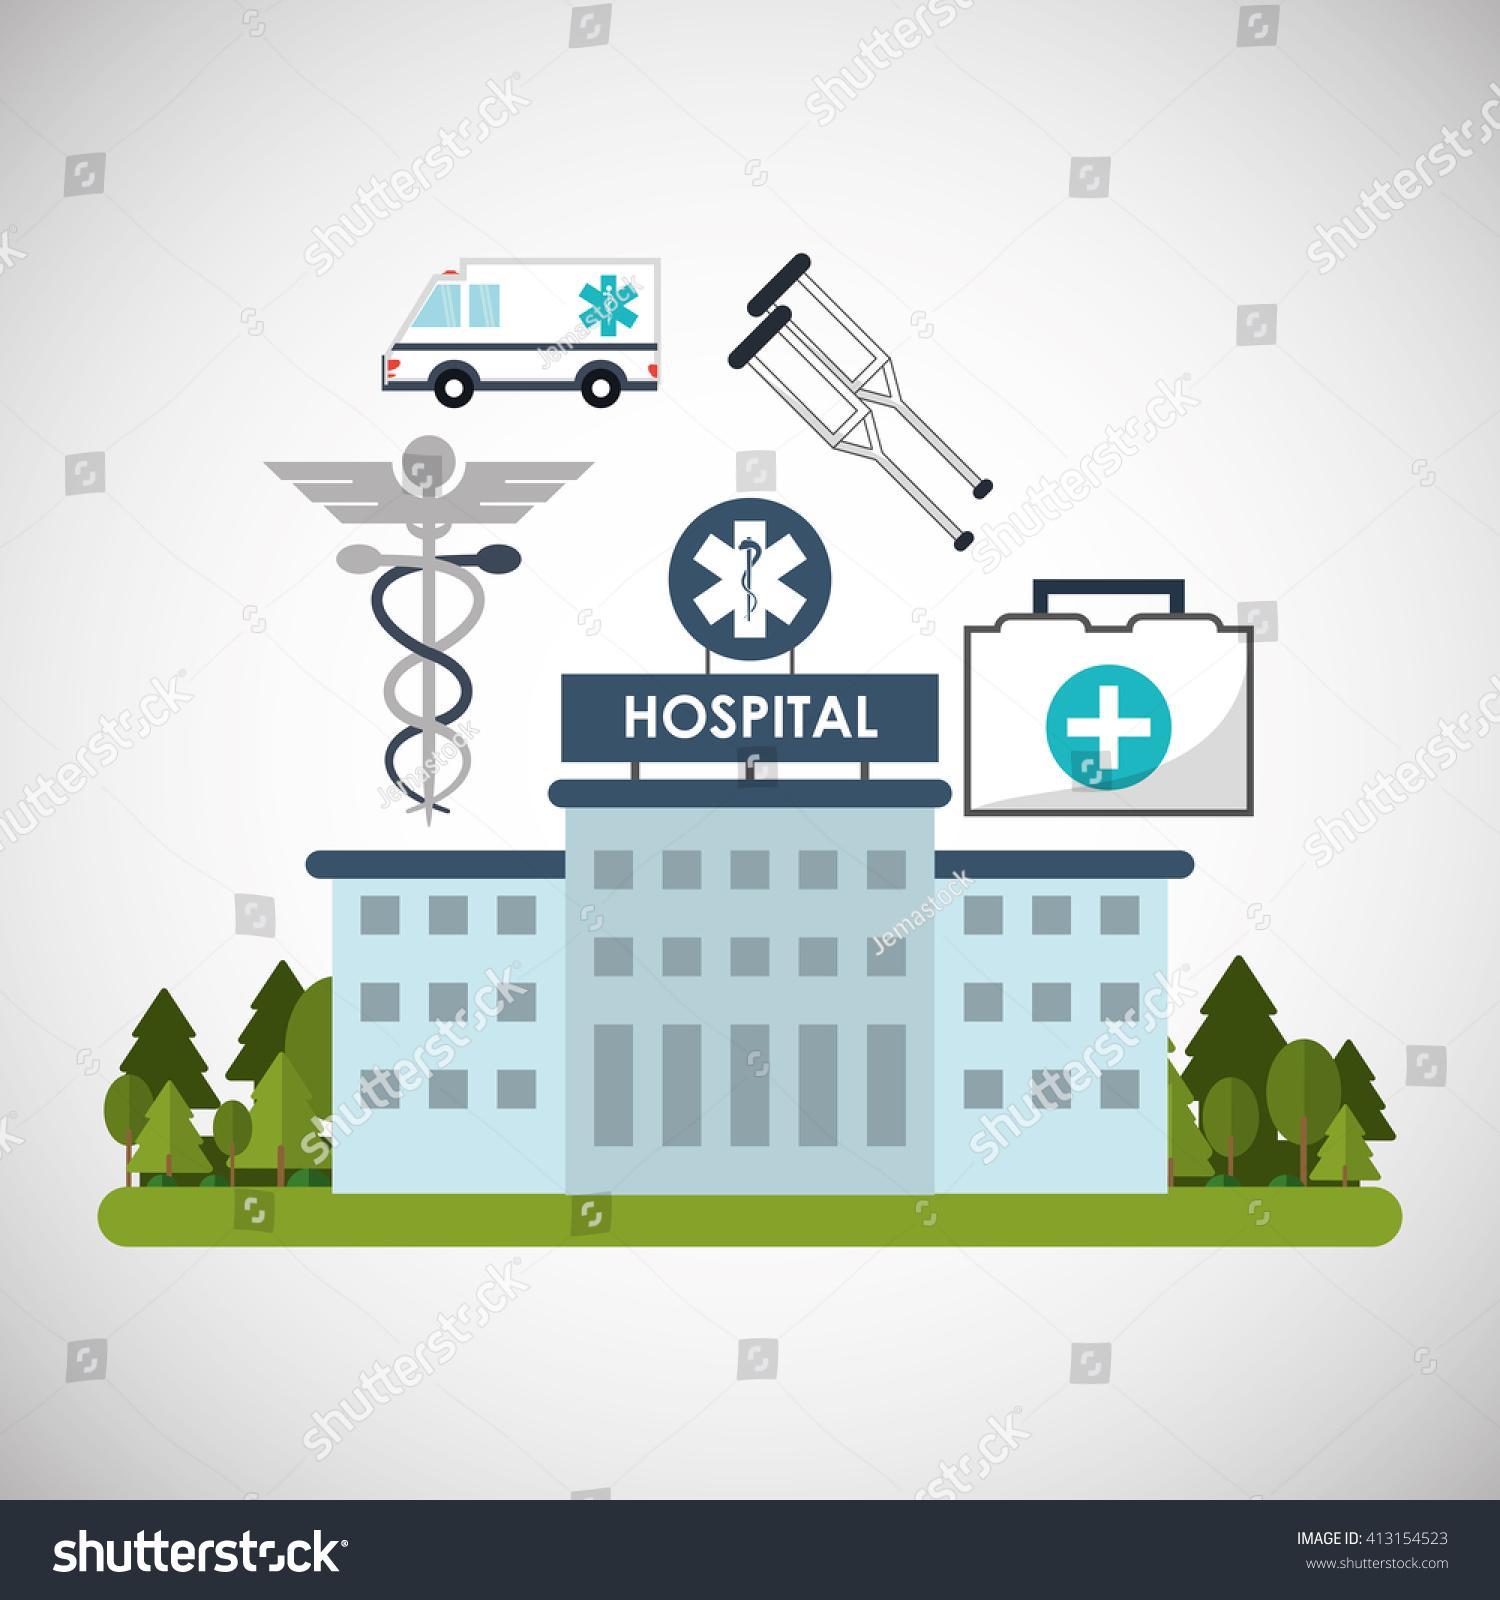 Hospital Design Healthy Center Emergency Concept Stock